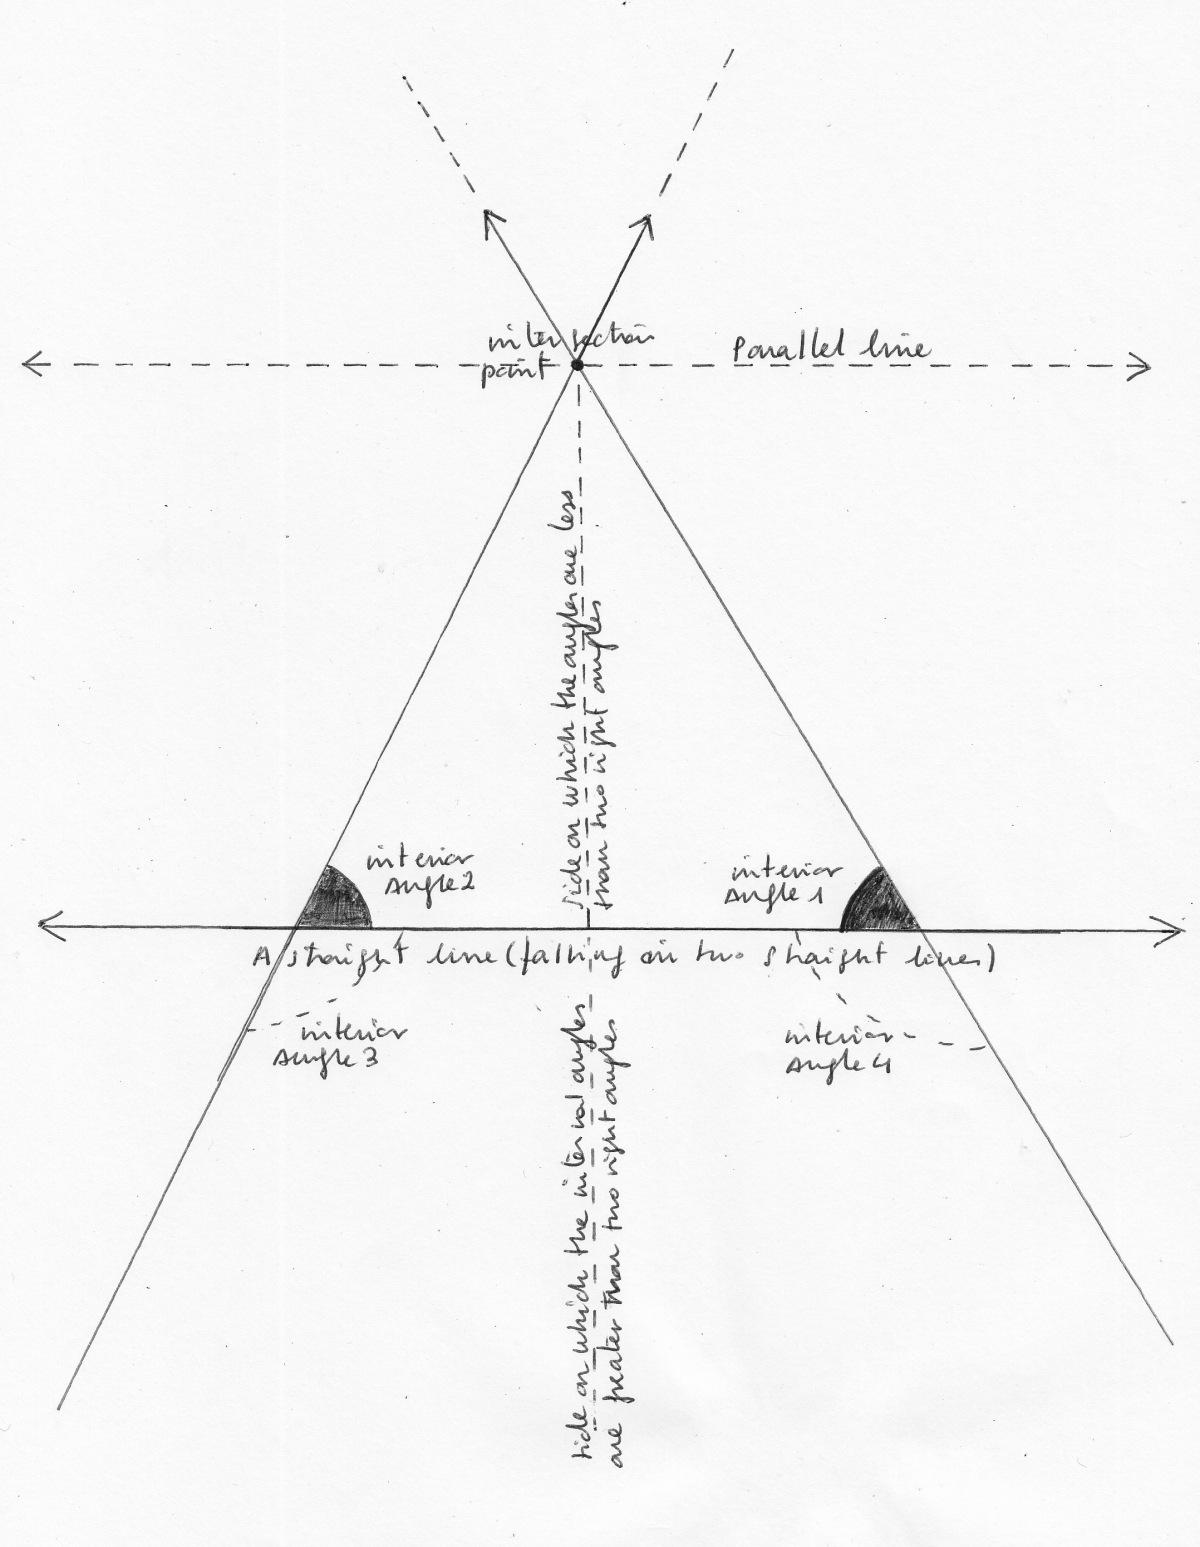 euclid_5img